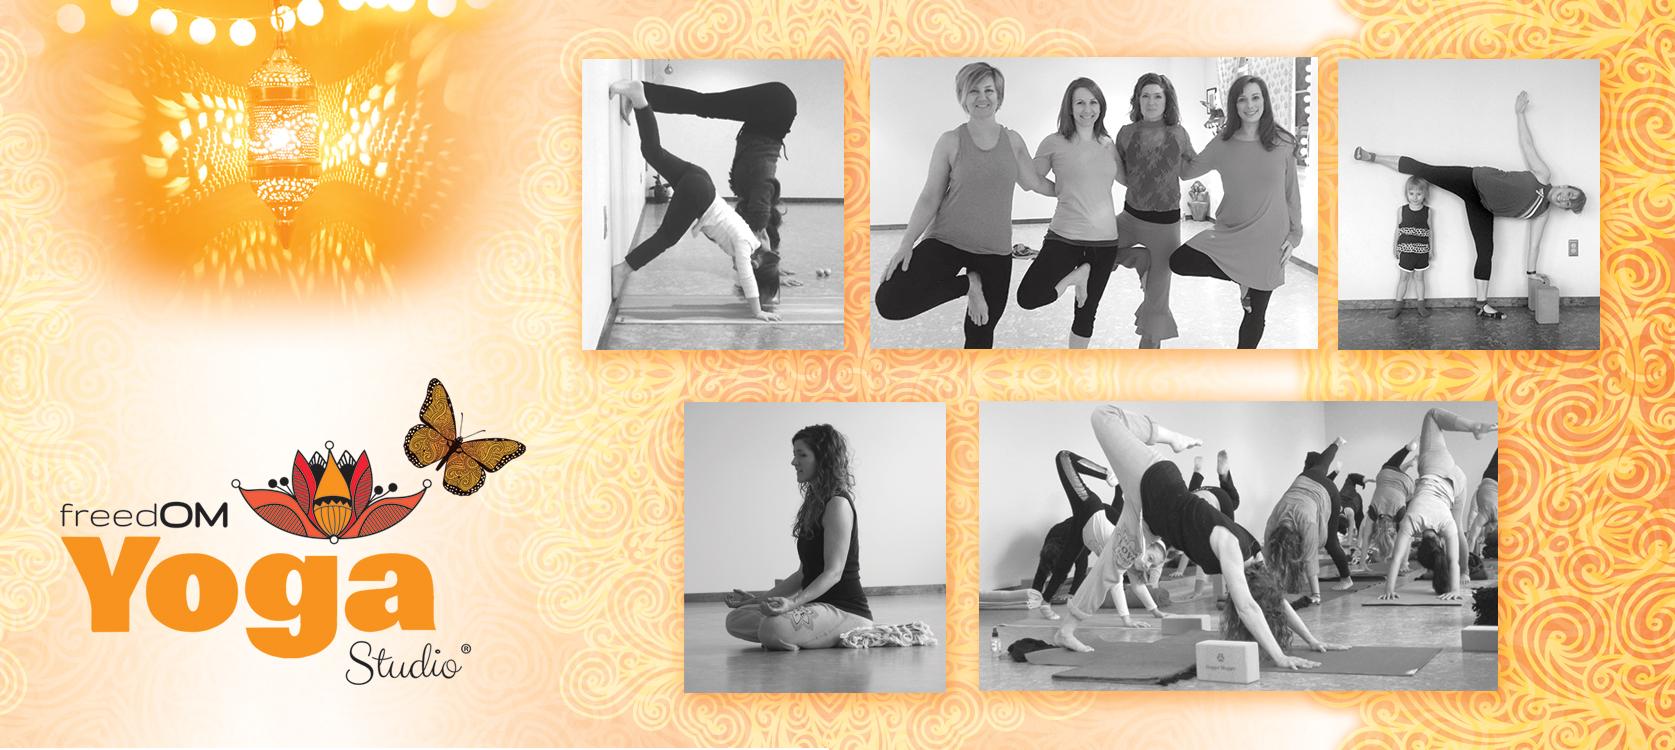 freedOM Yoga Studio Raritan New Jersey